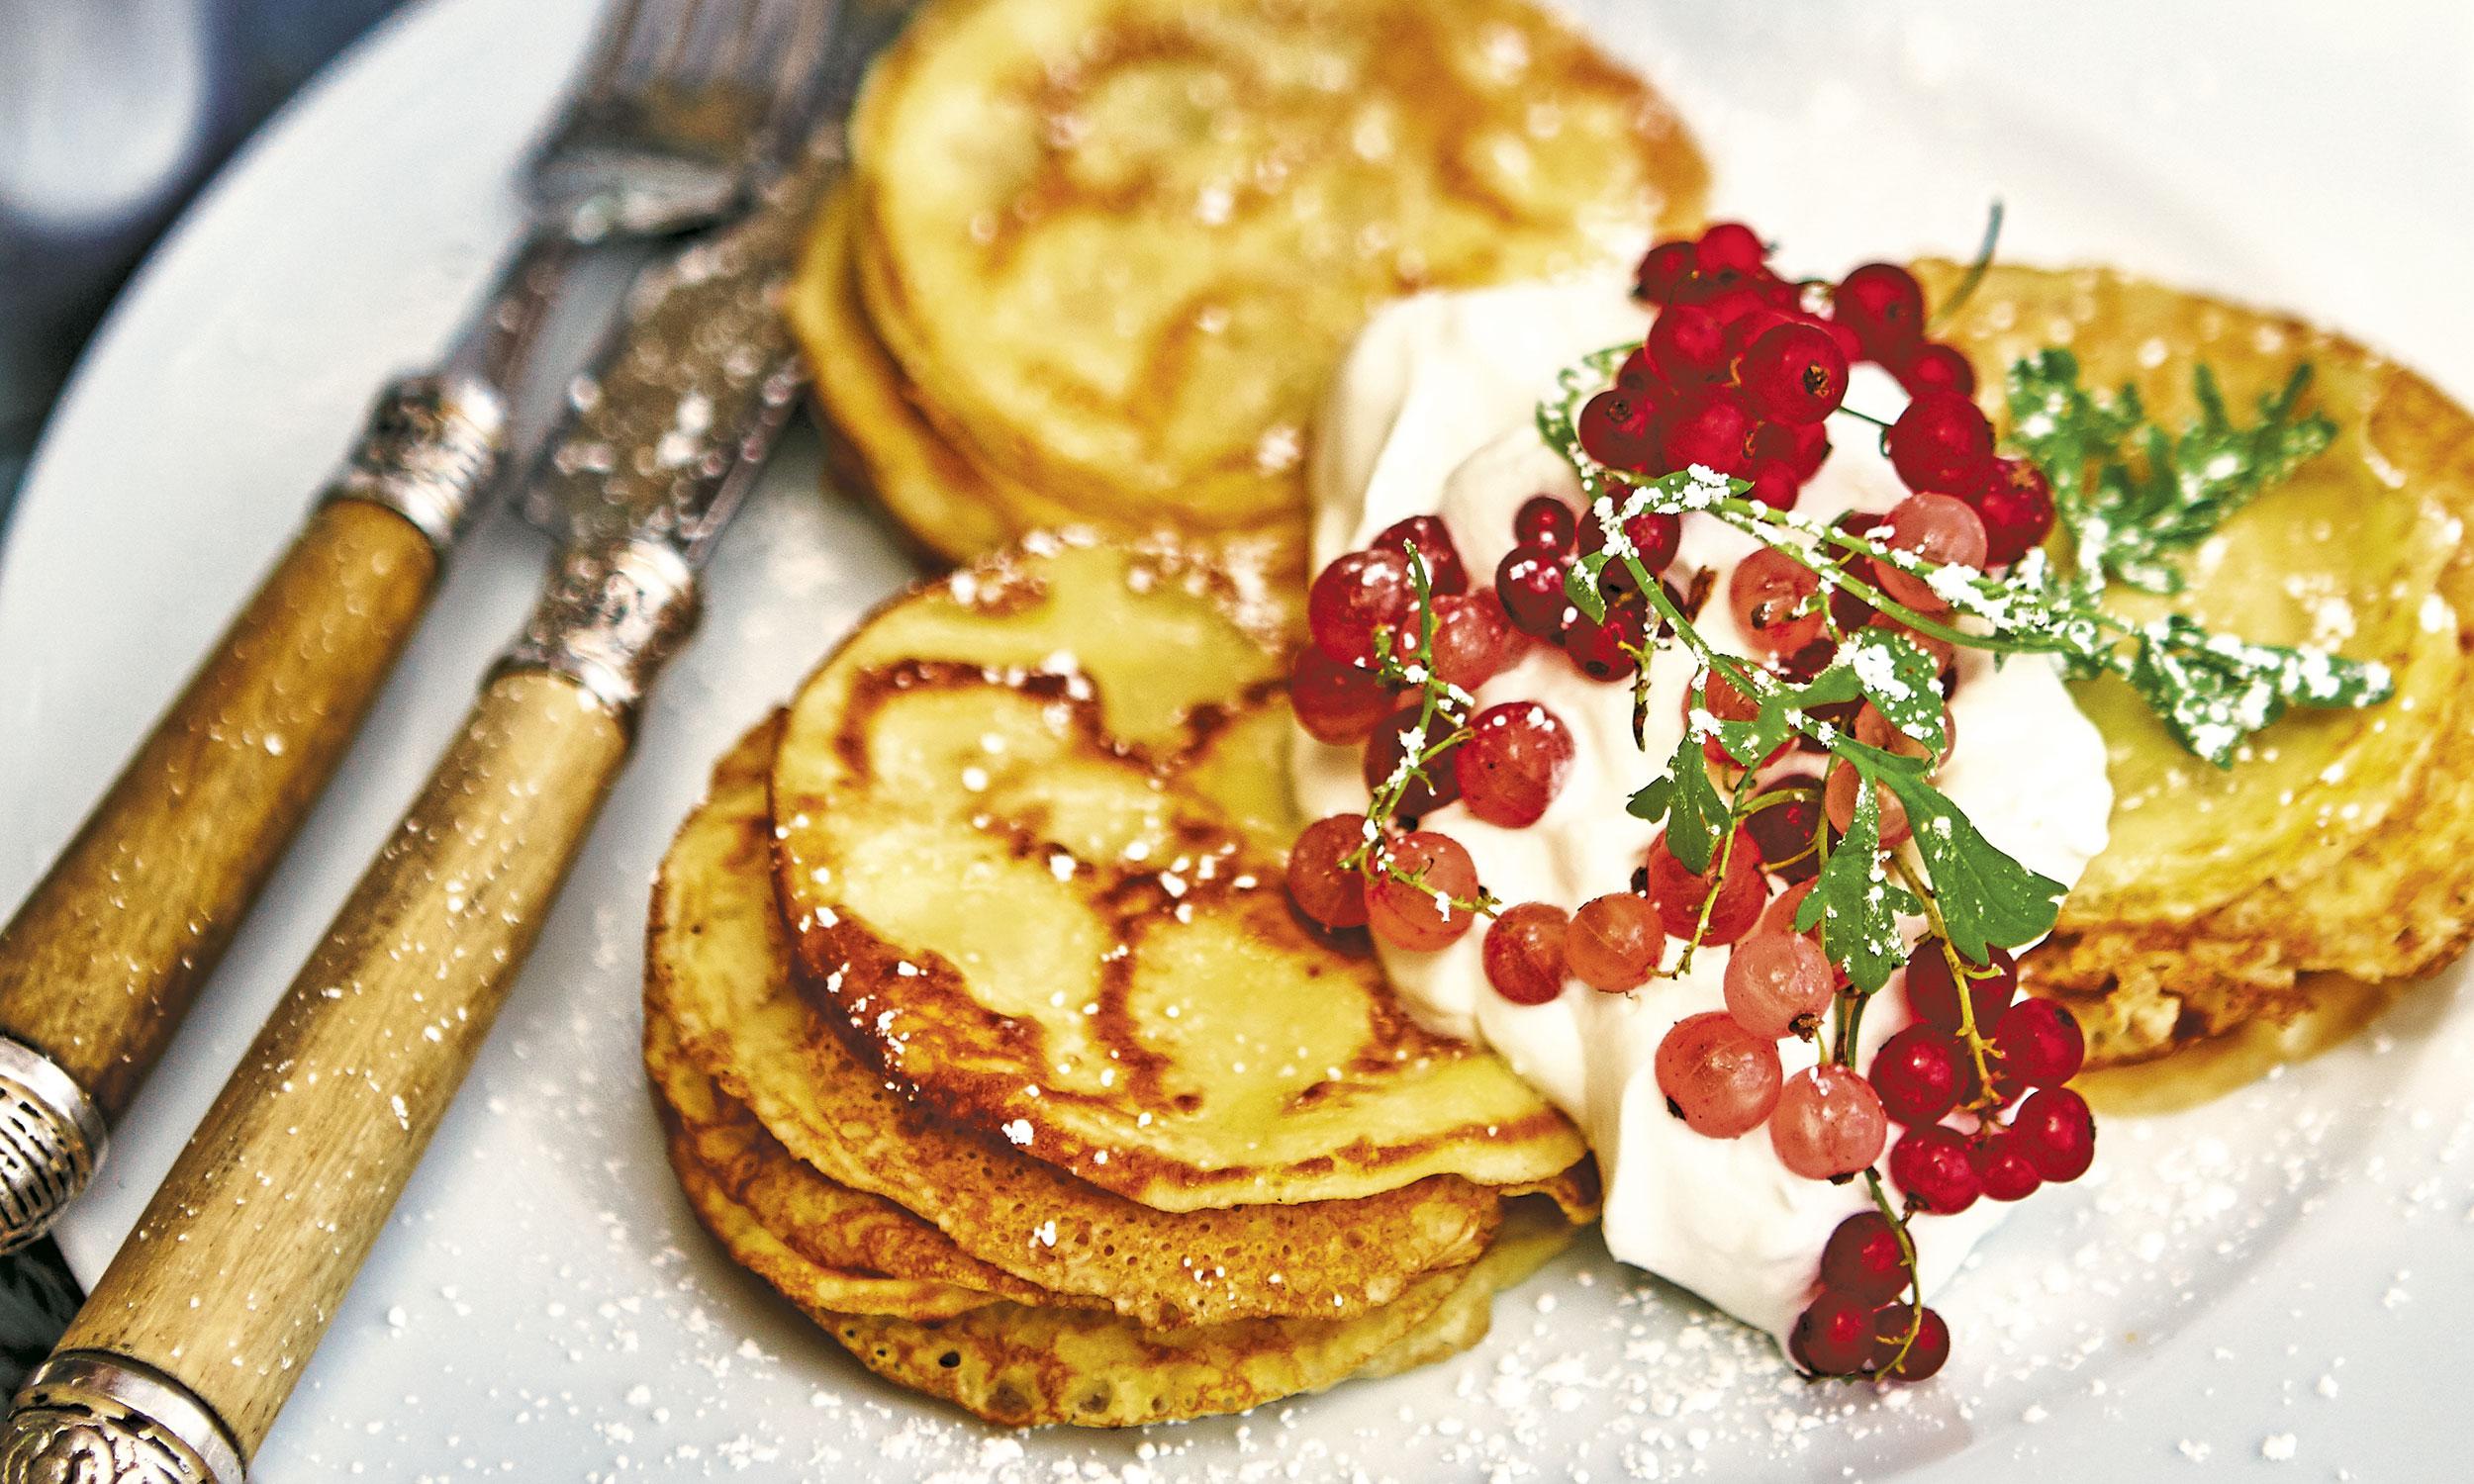 Make Ahead Mini Pancakes with Berries and Cream